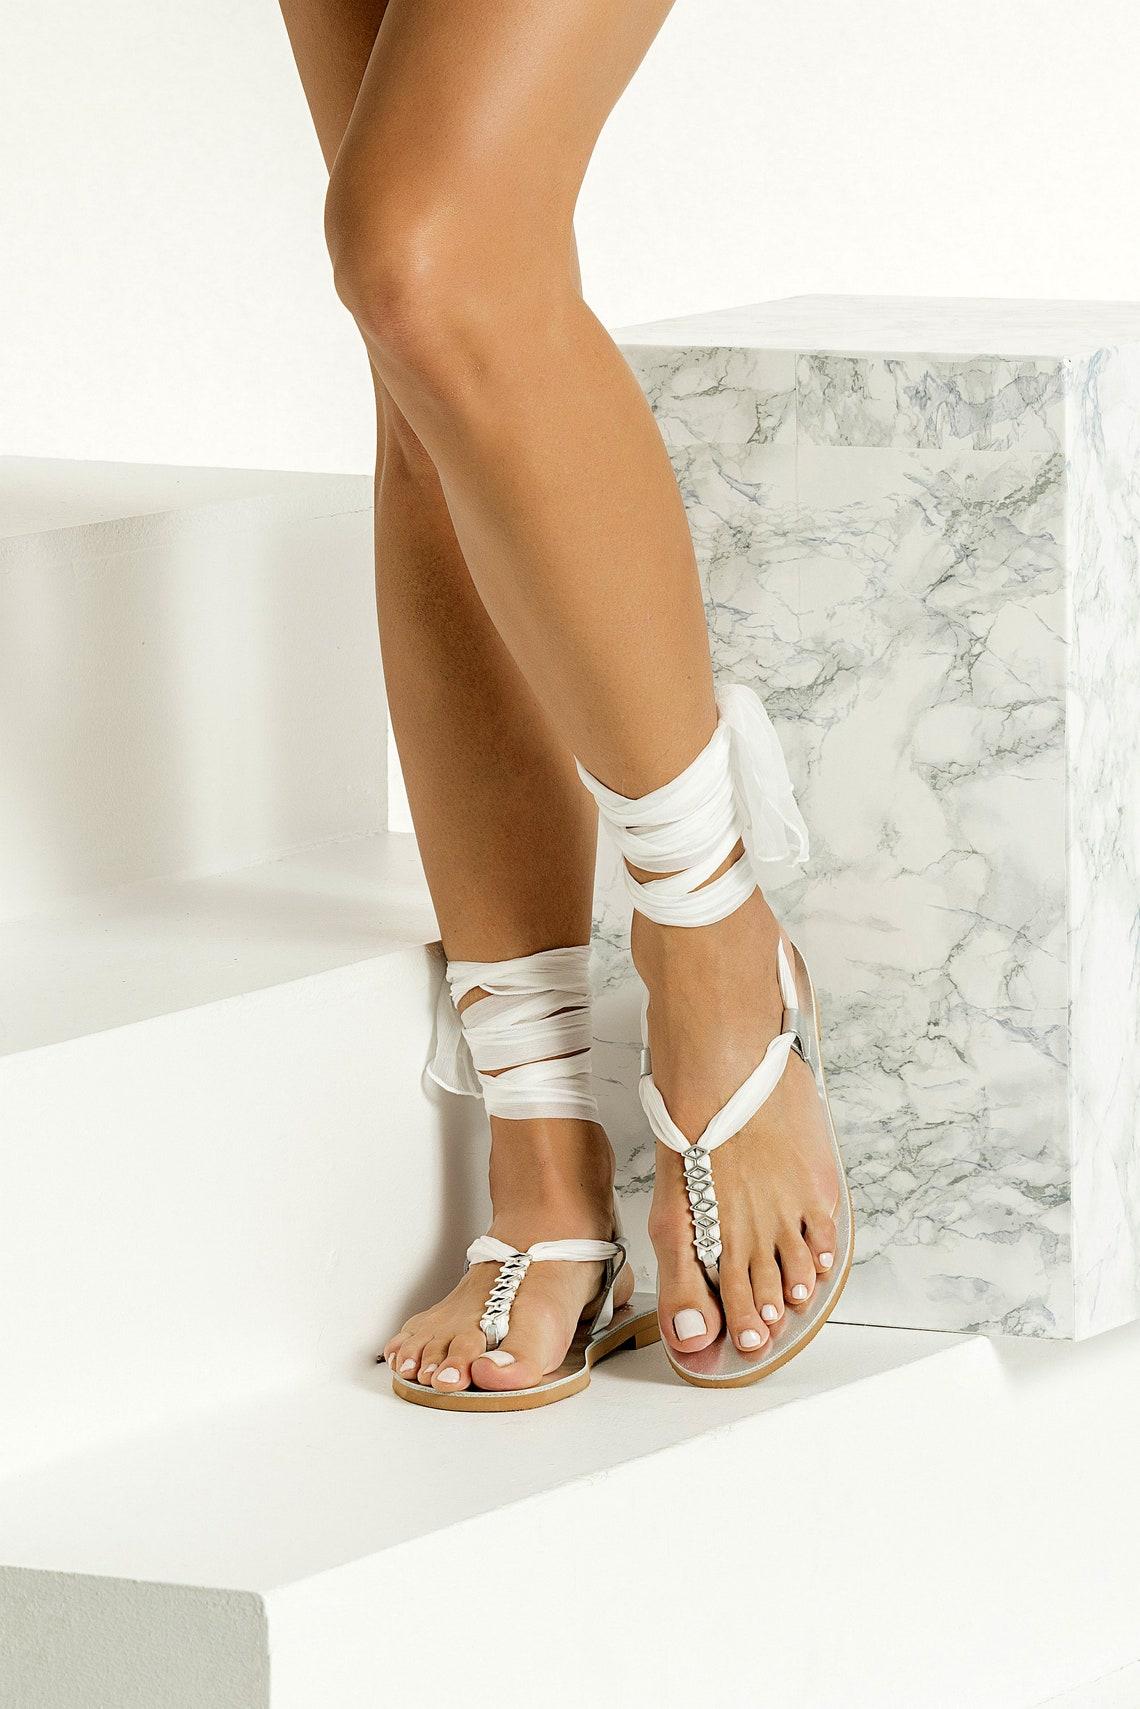 Wedding Sandals, White Bridal Sandals, Silver Wedding Shoes for Bride, Boho Lace up Flat Sandals, Beach Wedding Sandals, Sophia III